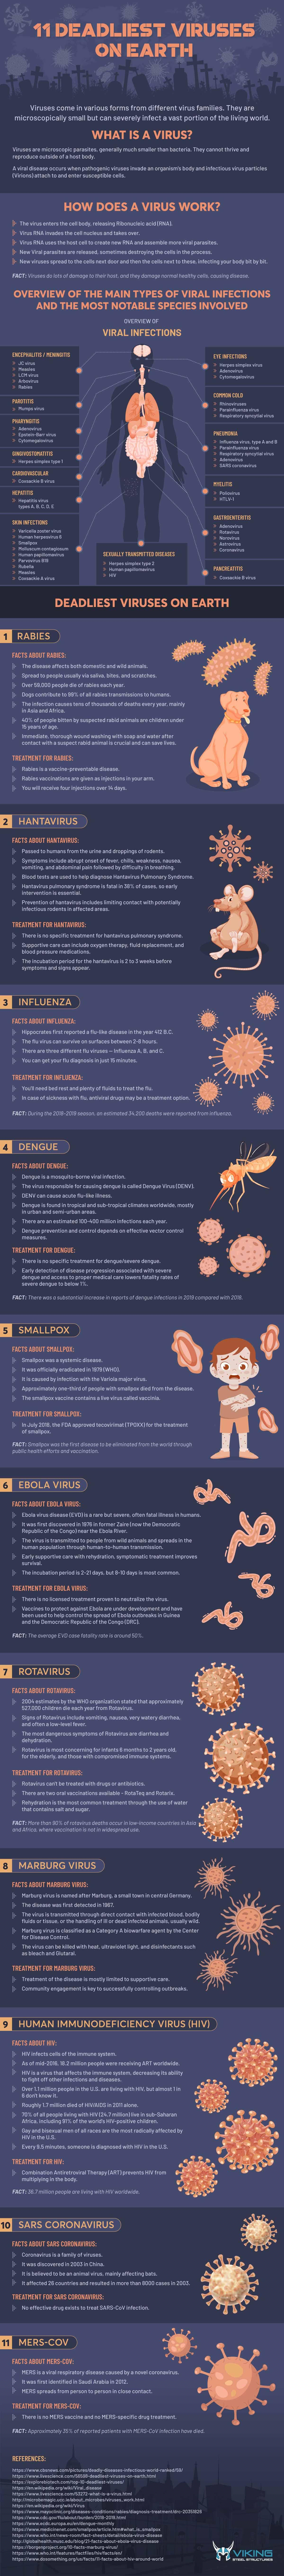 11 Deadliest Viruses On Earth